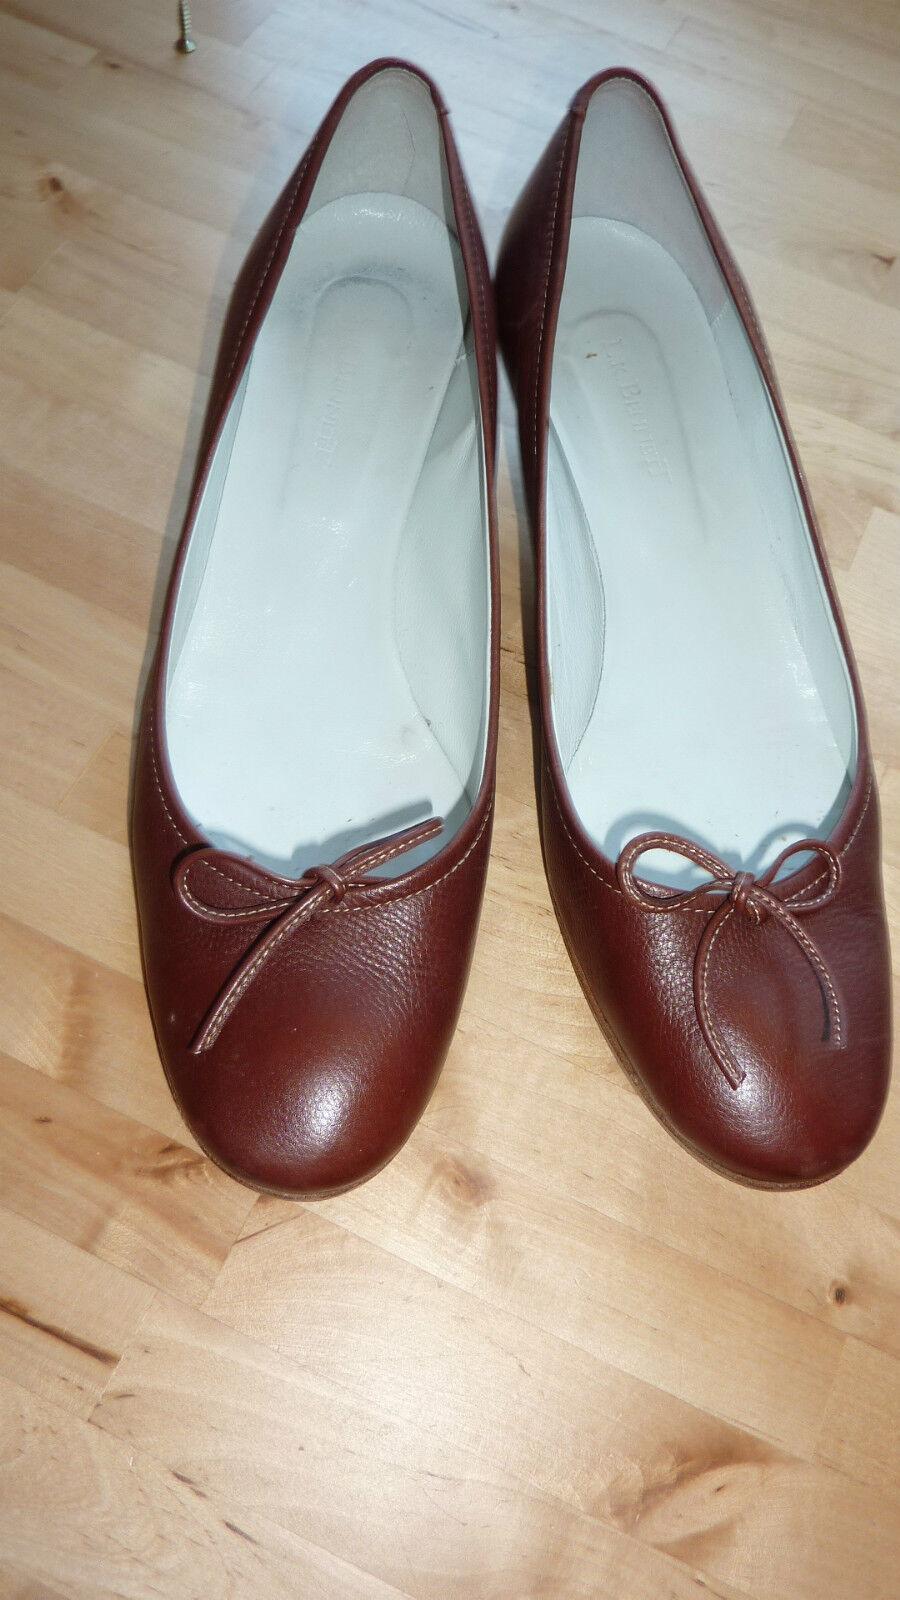 LK L K Bennett 7 40 Mid marron tribunaux Teddy Ballerine Pompe Chaussures en cuir RARE